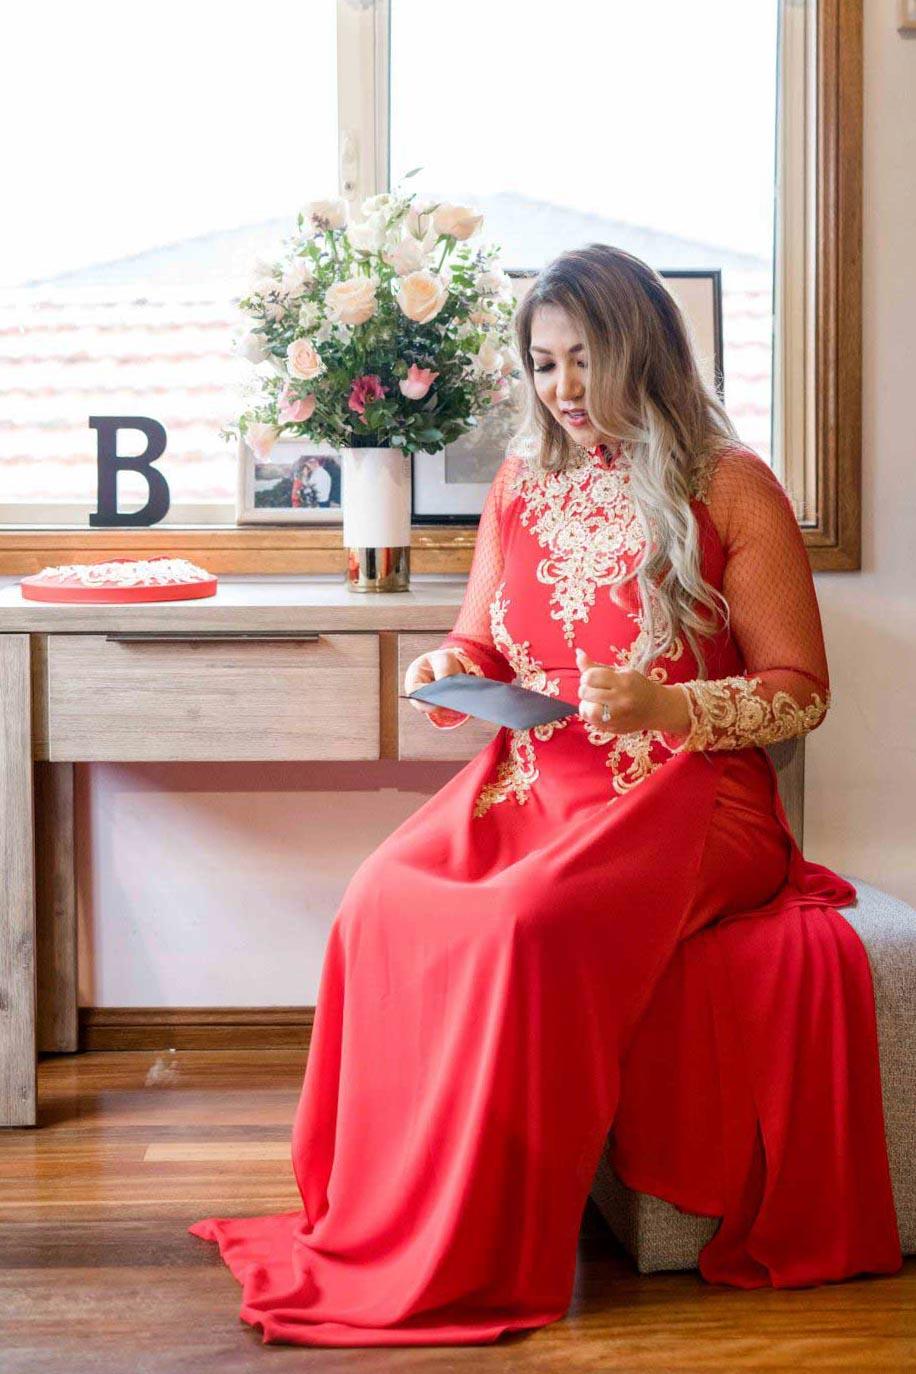 Belinda's Wedding Ao Dai Photo 3